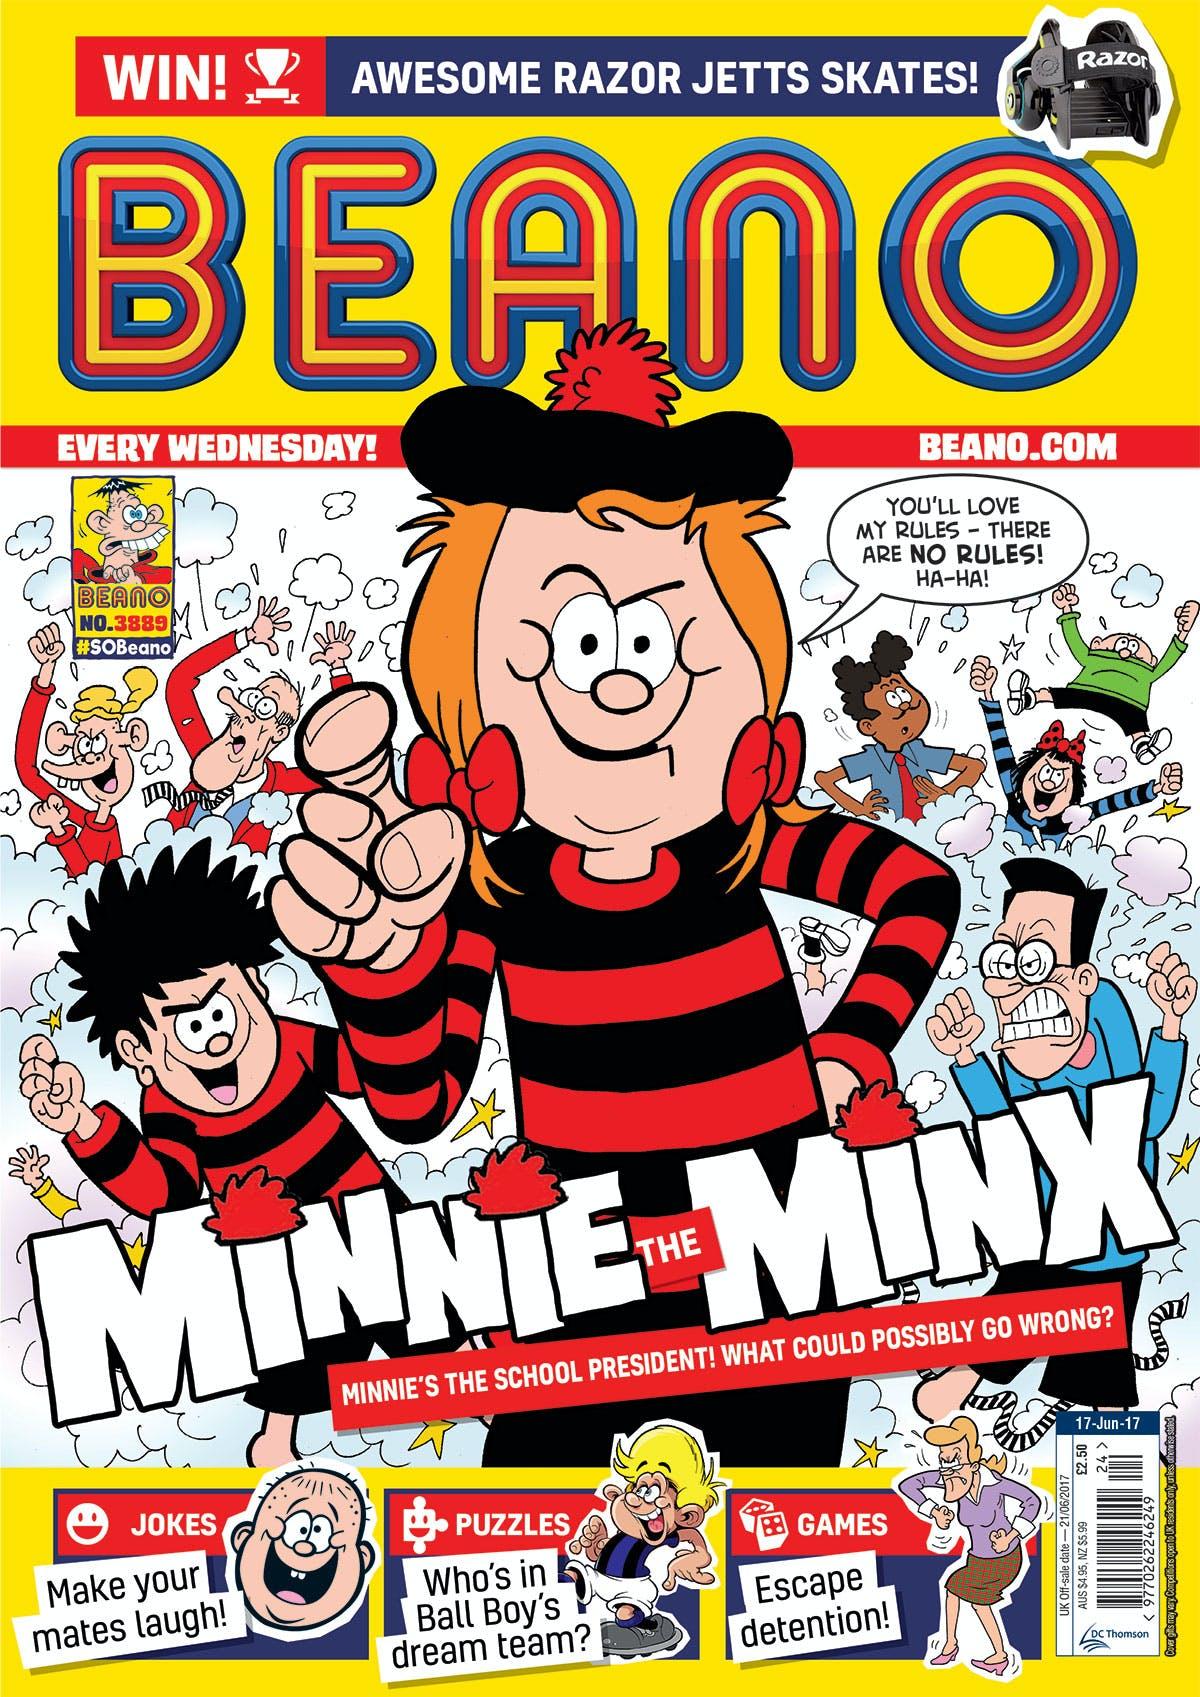 Beano 17th June 2017 No. 3889